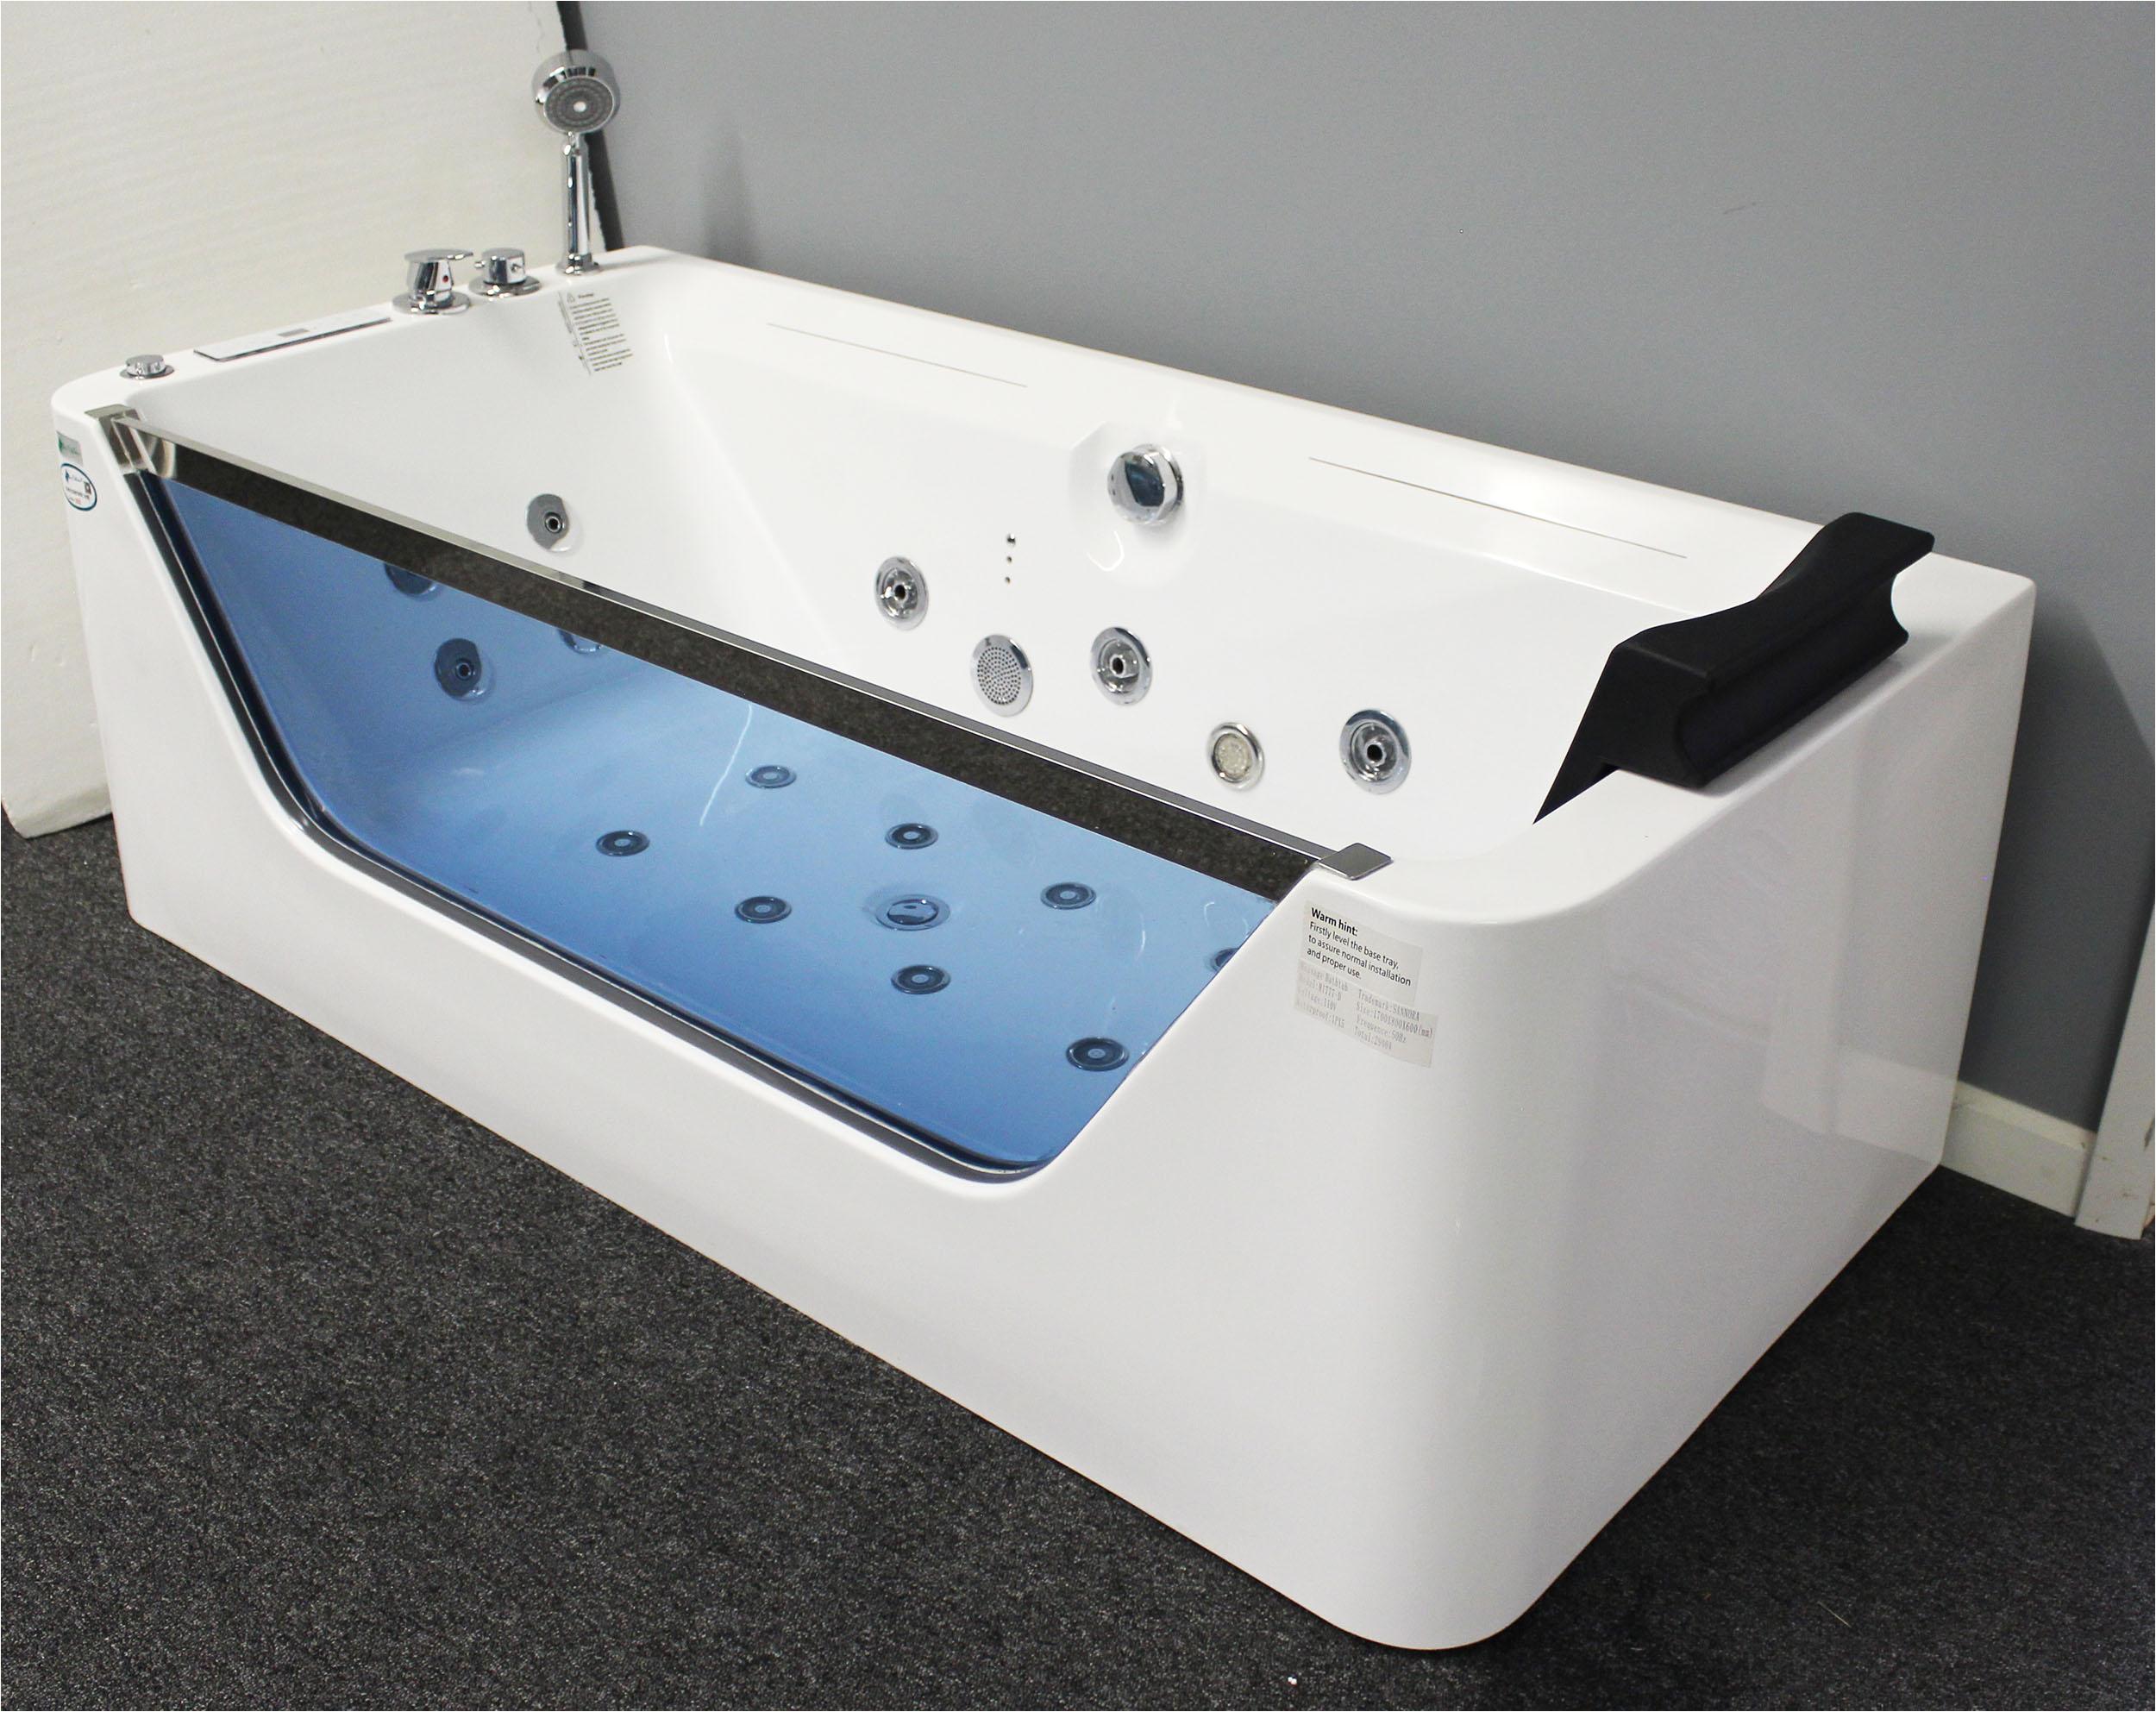 Jetted Bathtub Heater Jetted Bathtub Whirlpool & Air Massage Waterfall Heater